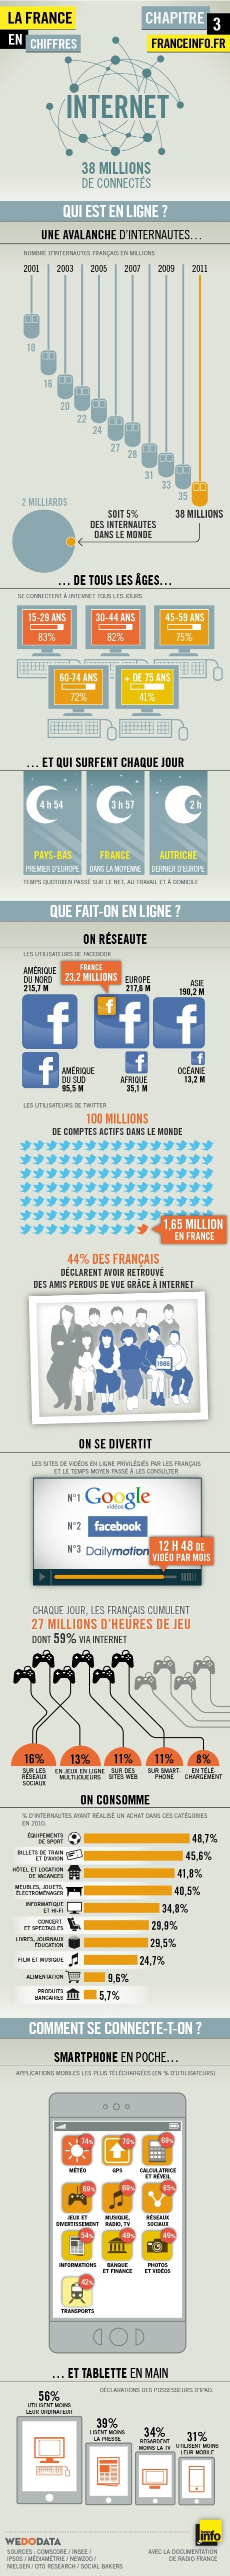 La France en chiffres : internet - FR